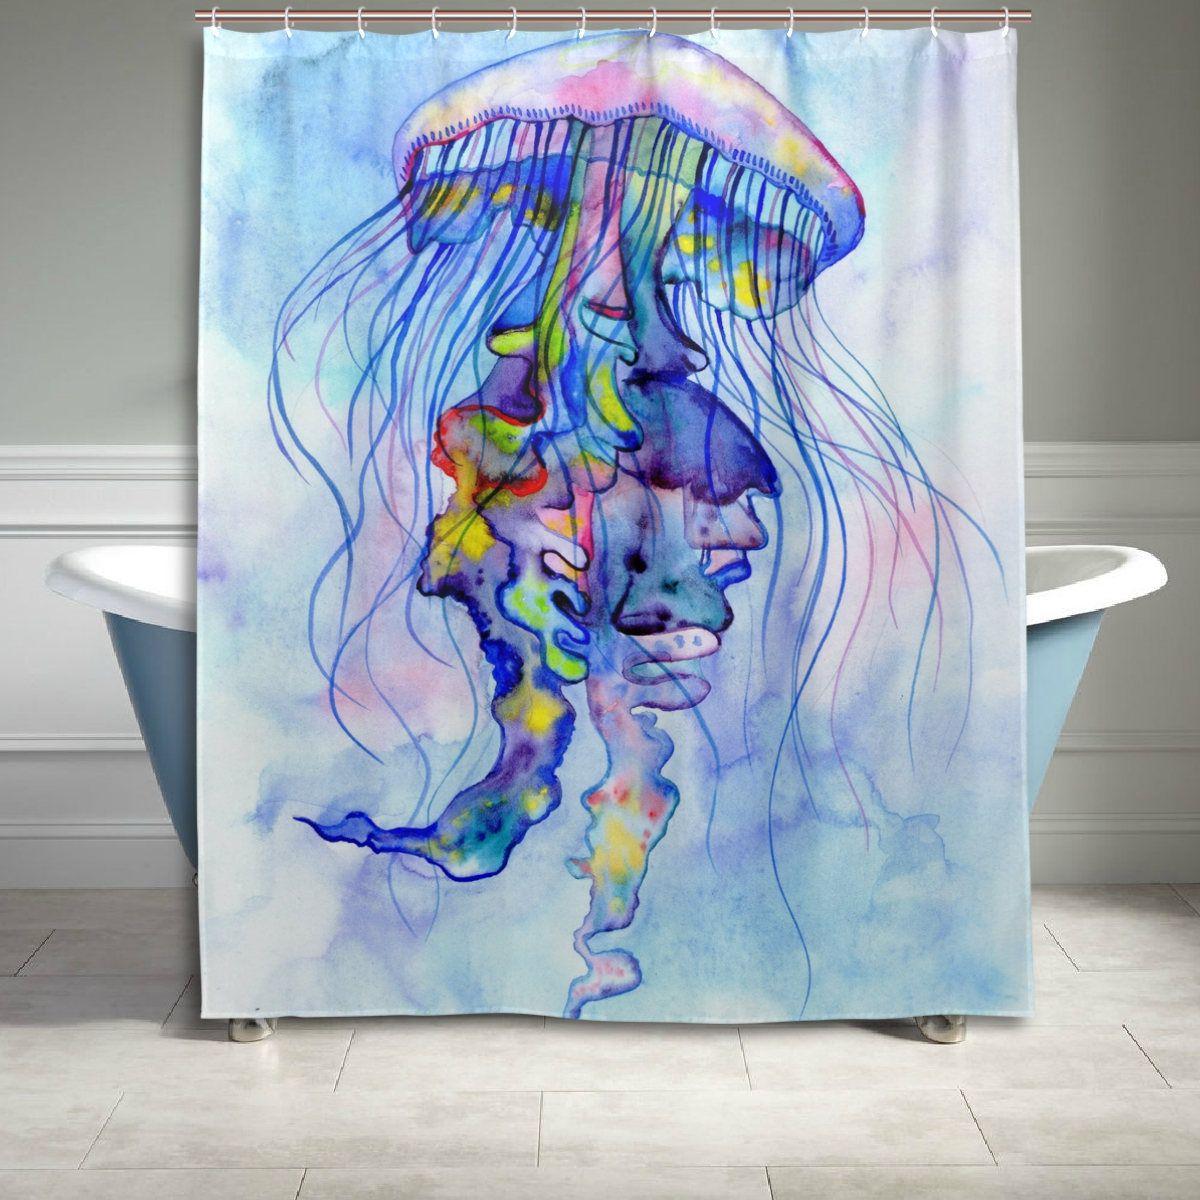 Watercolor Blue Jellyfish Shower Curtain Bathroom Decor Home Decor